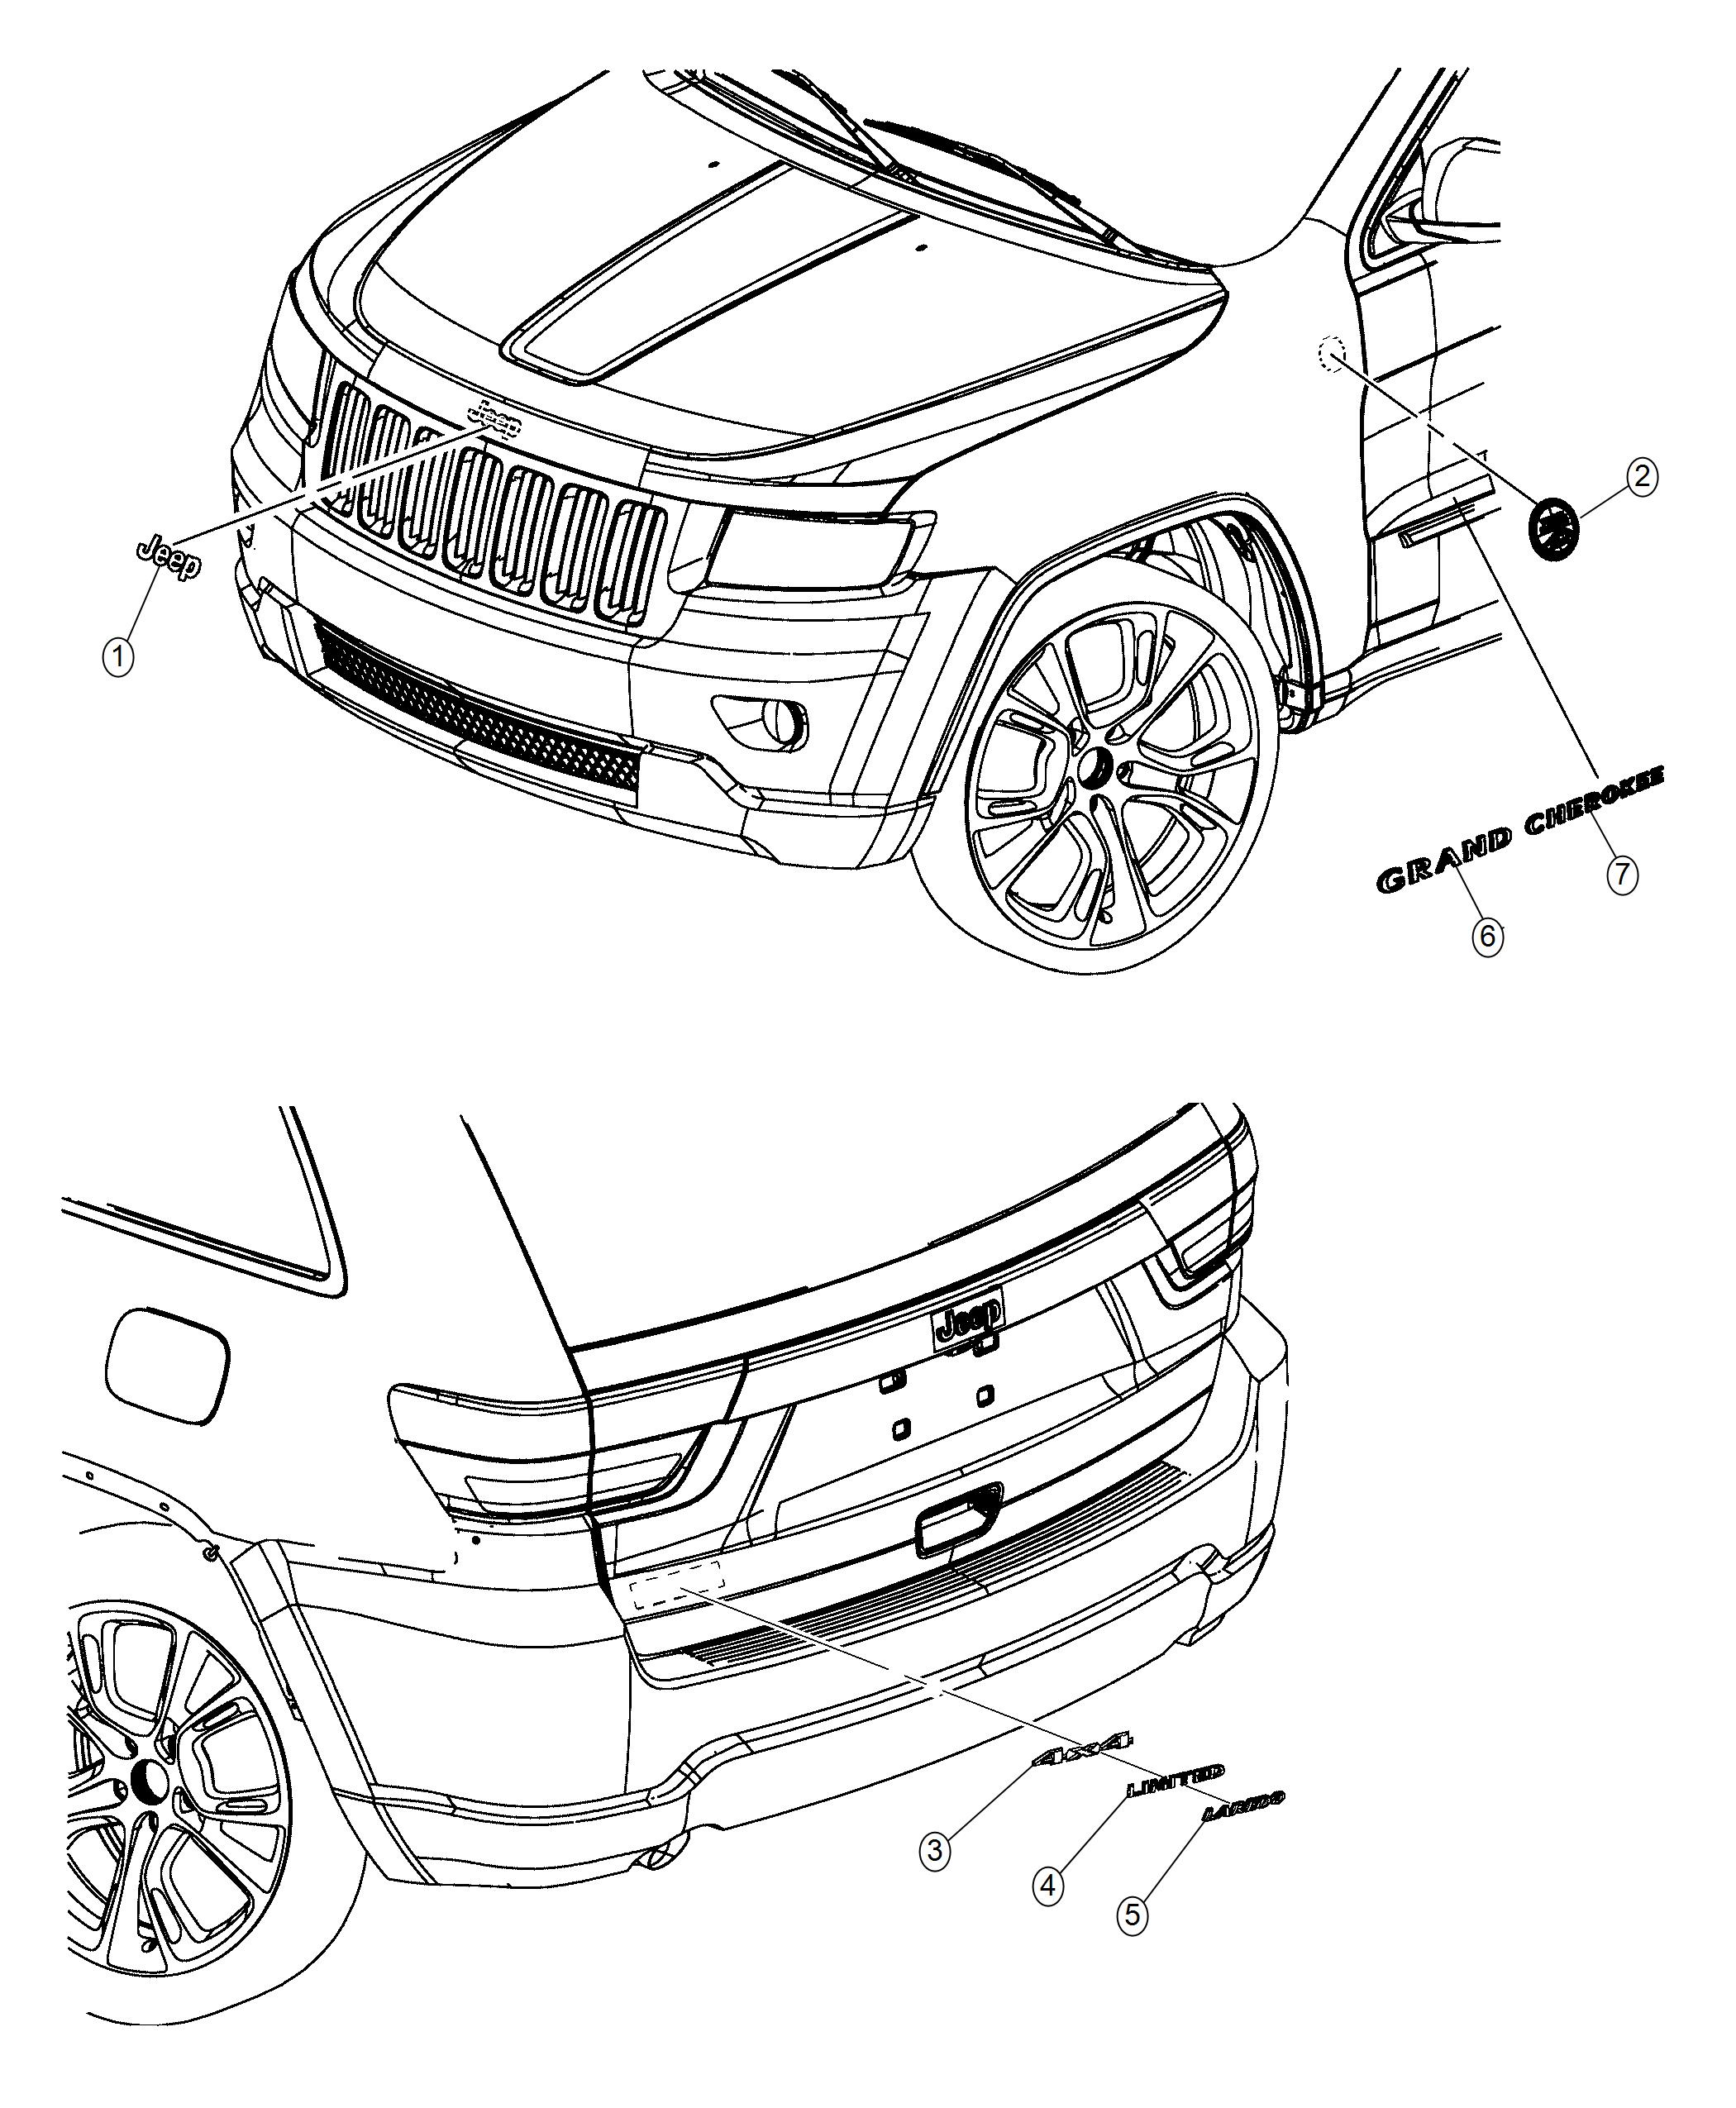 2014 Jeep Patriot Emblem | Wiring Diagram Database